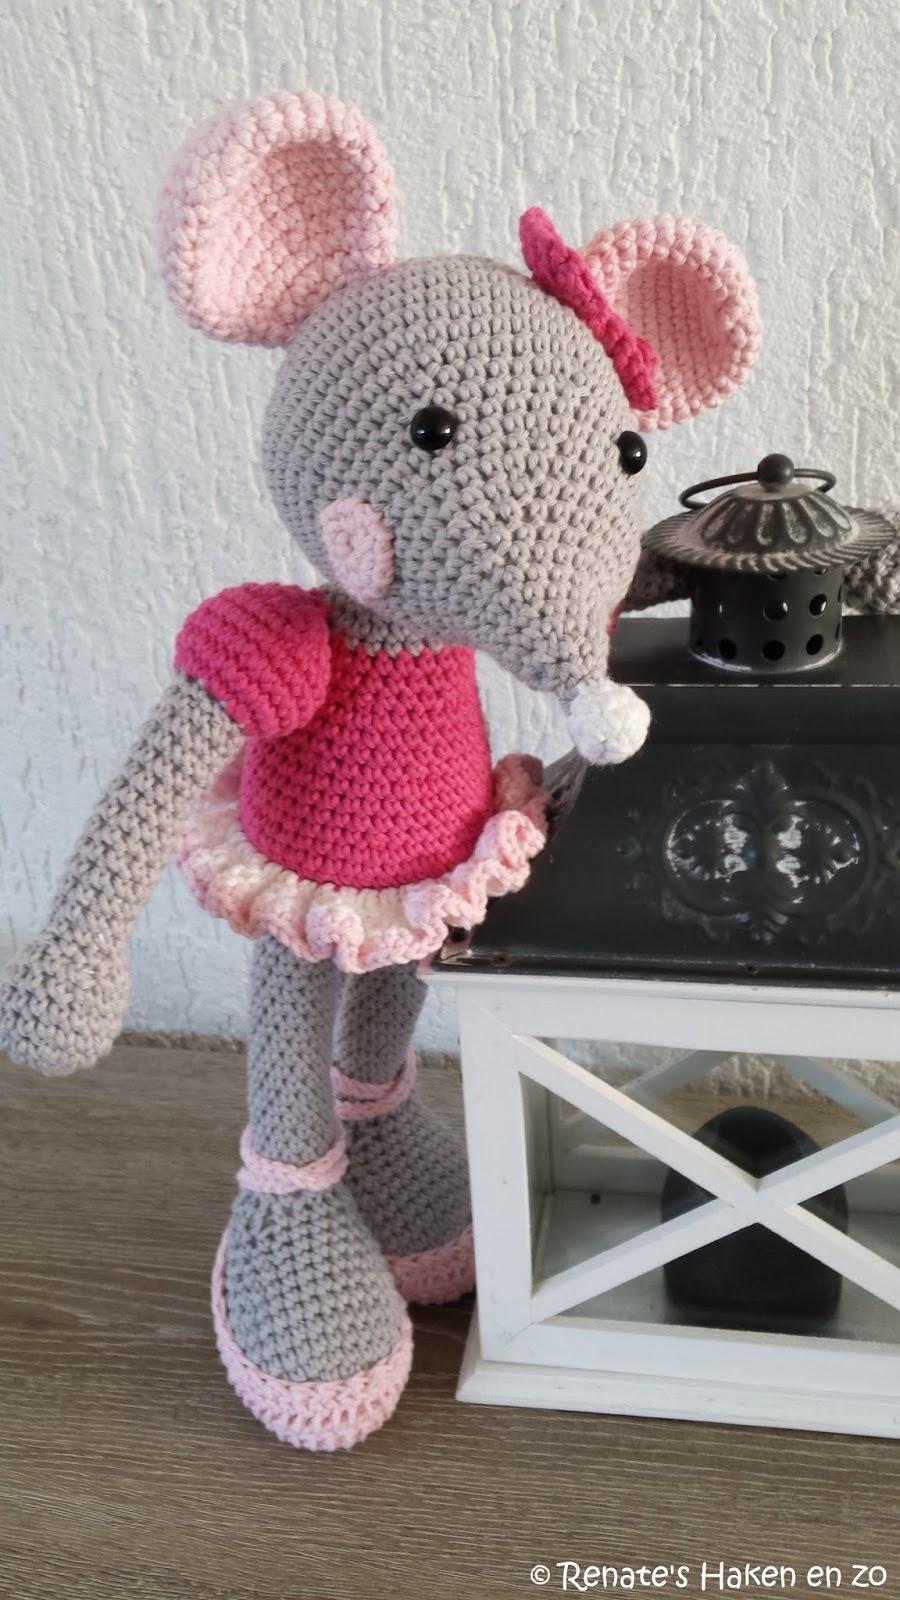 Betoverende amigurumi-knuffels - Hobbydoos.nl | 1600x900